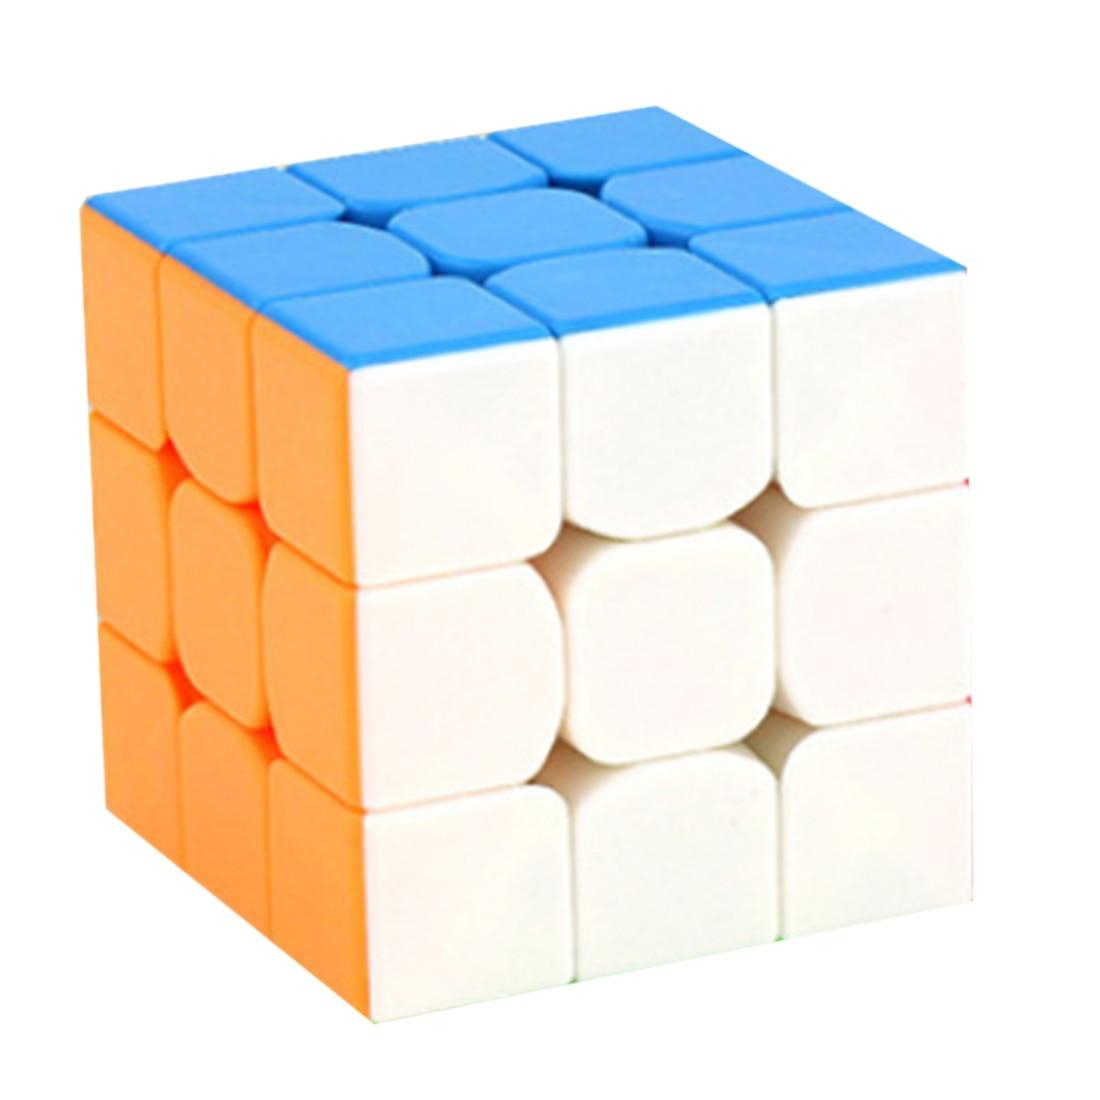 Cubo mágico Moyu colorido Mini 3x3x3 de tres capas competición profesional Cubo de velocidad sin pegatinas rompecabezas Cubo mágico juguete fresco Niño